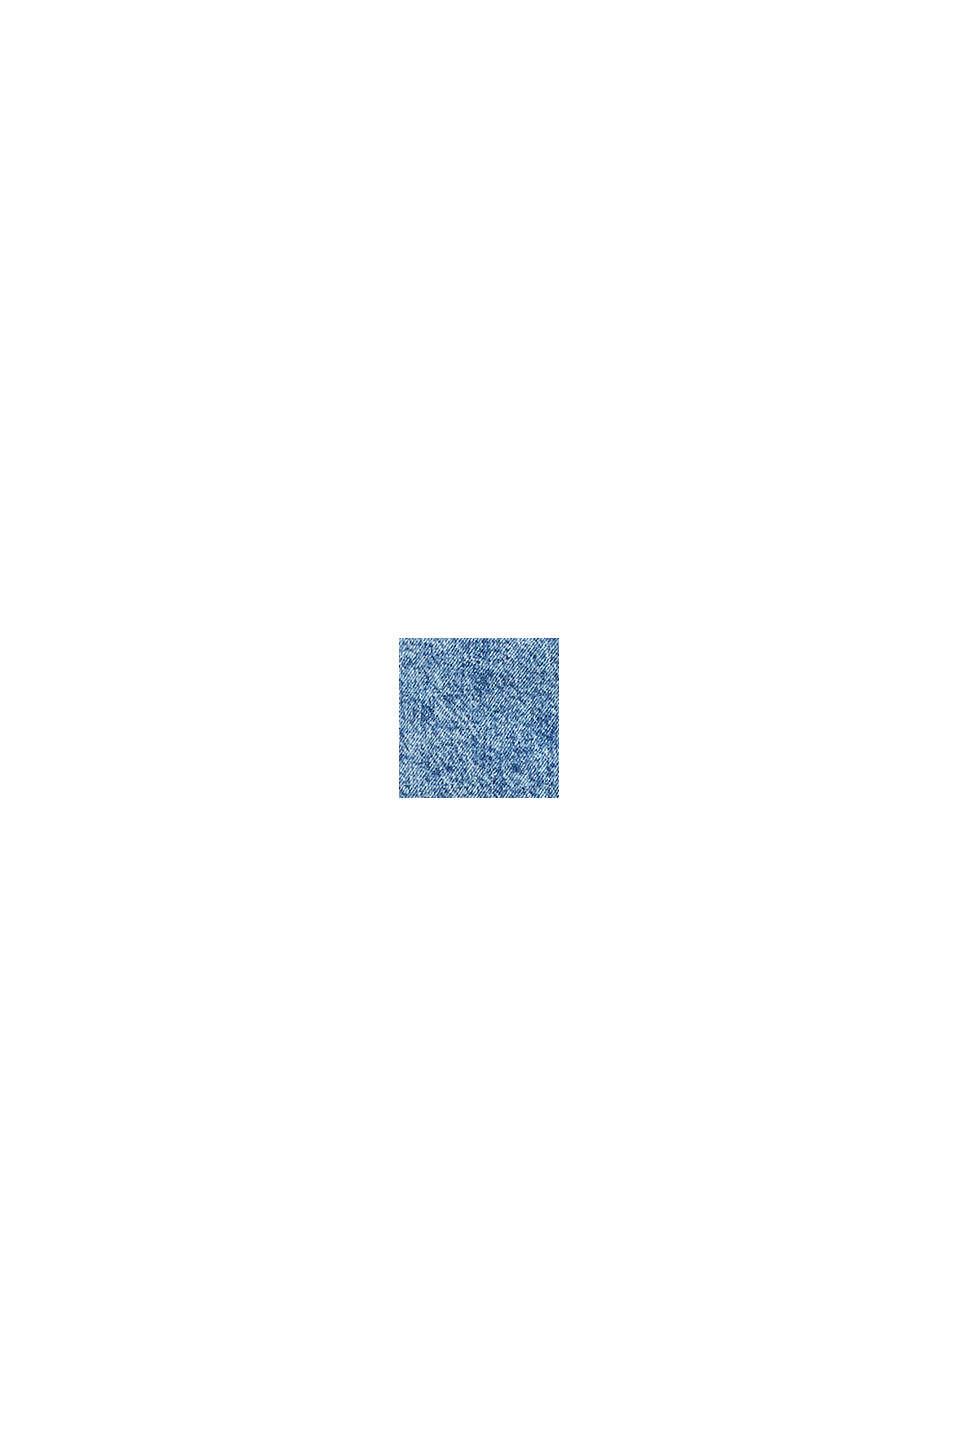 Jeans-Rock mit Knopfleiste, recycelt, BLUE BLEACHED, swatch